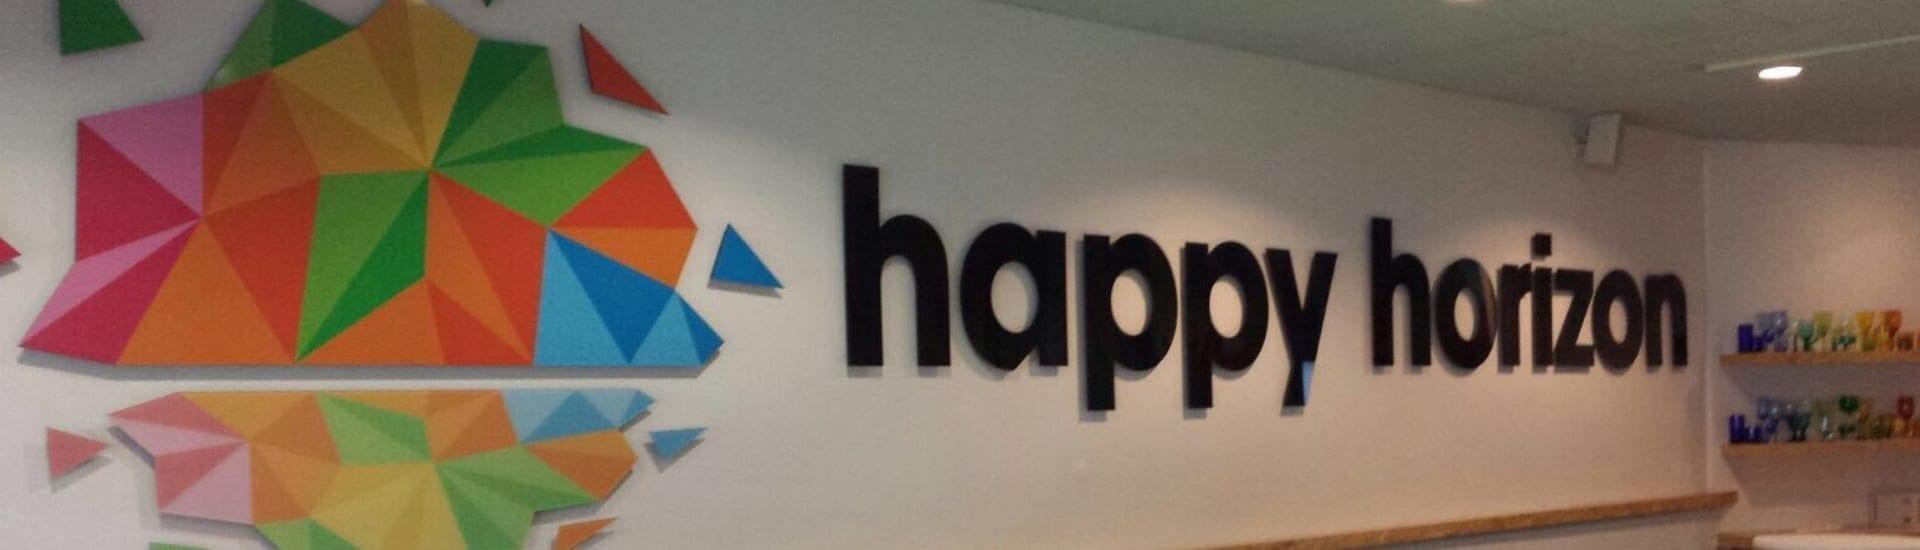 Header Happy